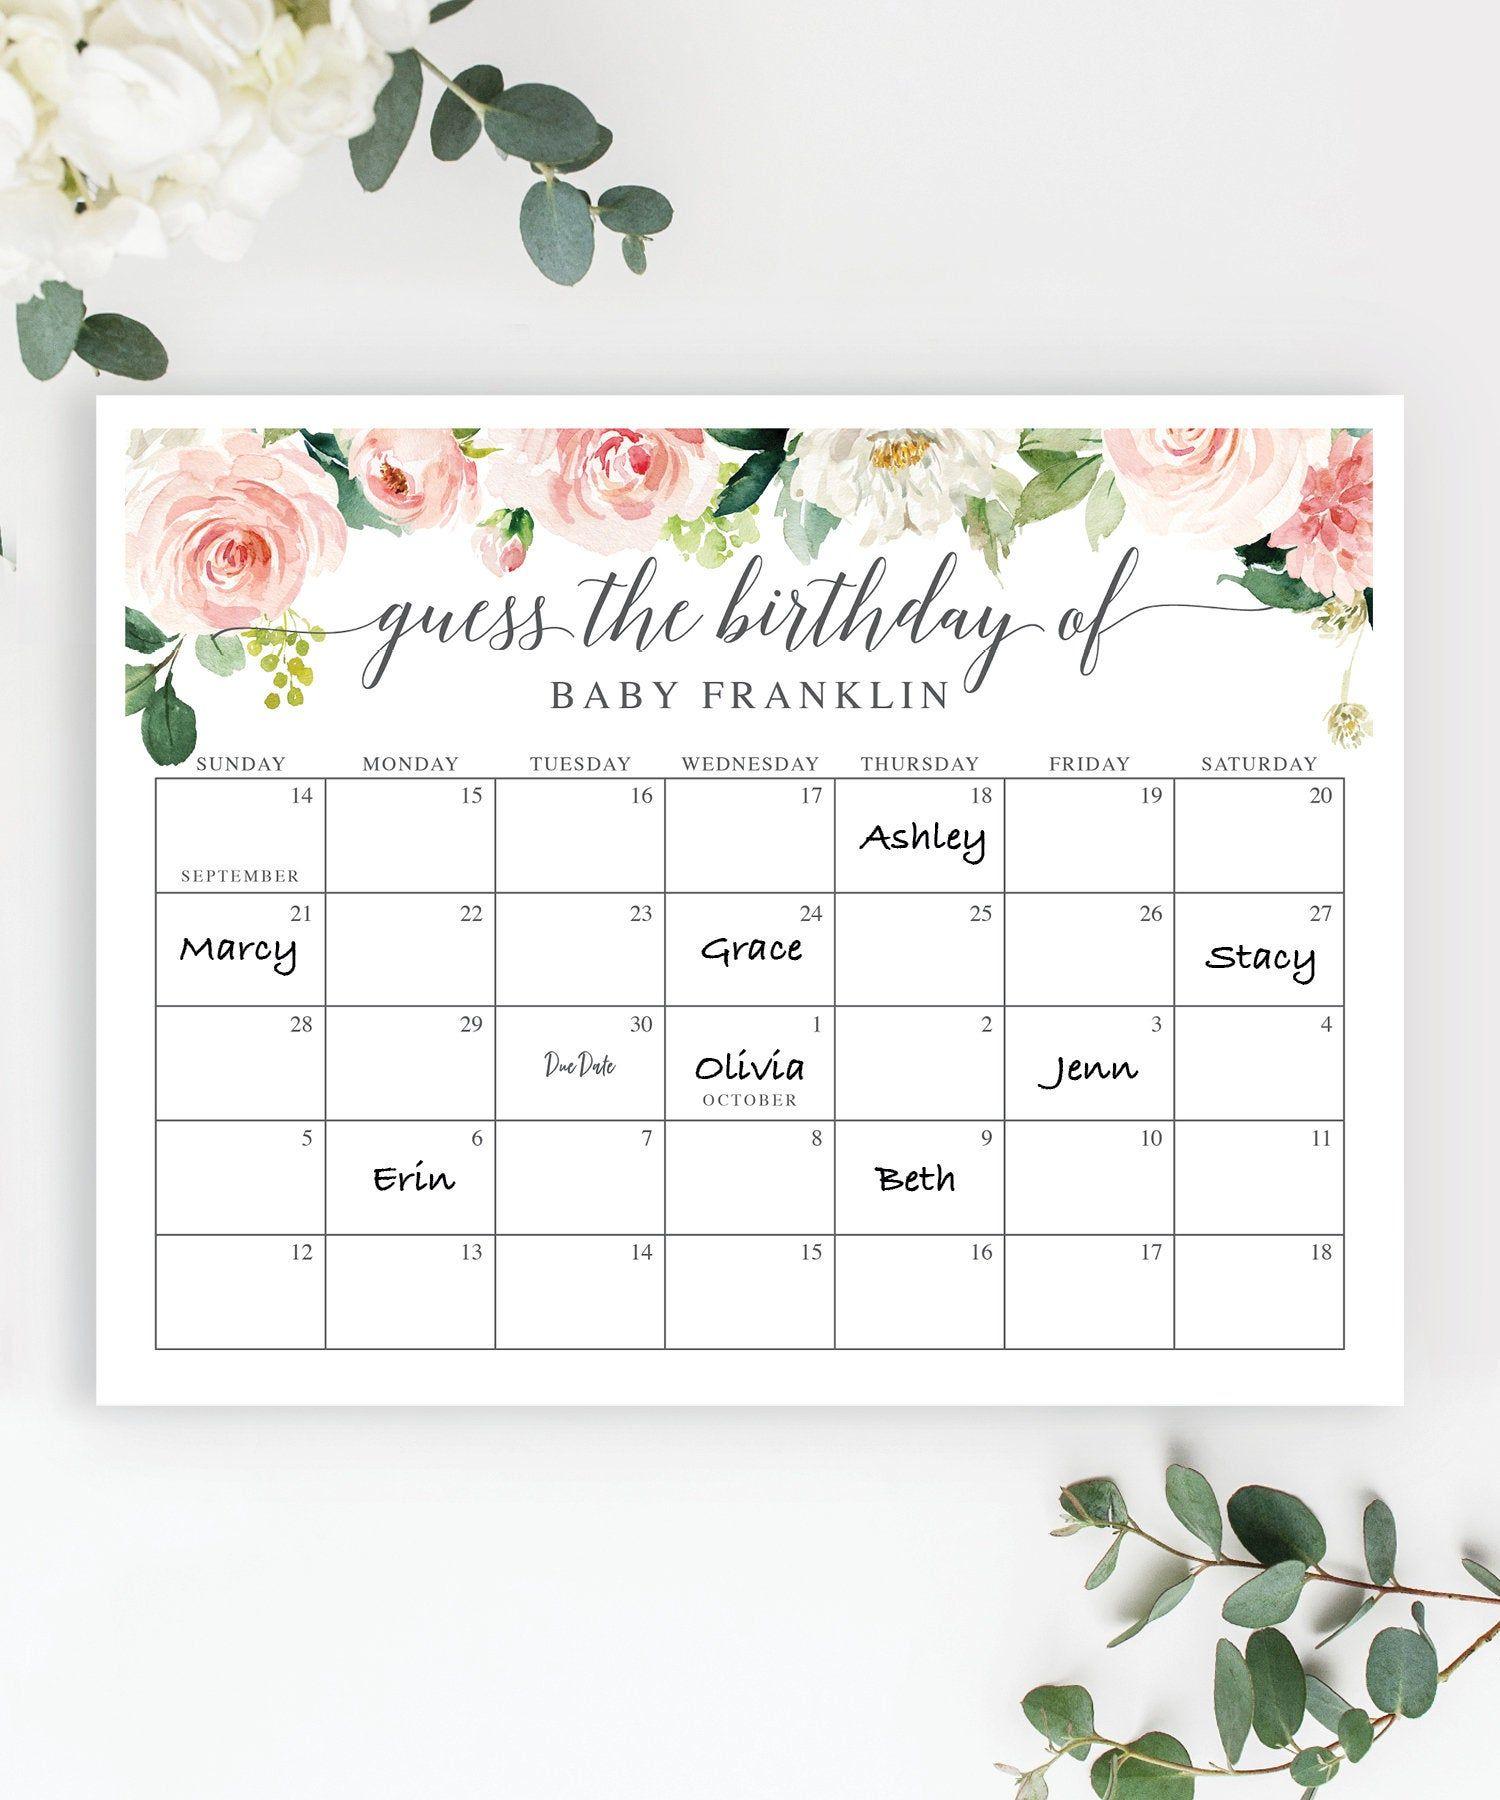 Baby Due Date Calendar Baby Shower Birthday Prediction